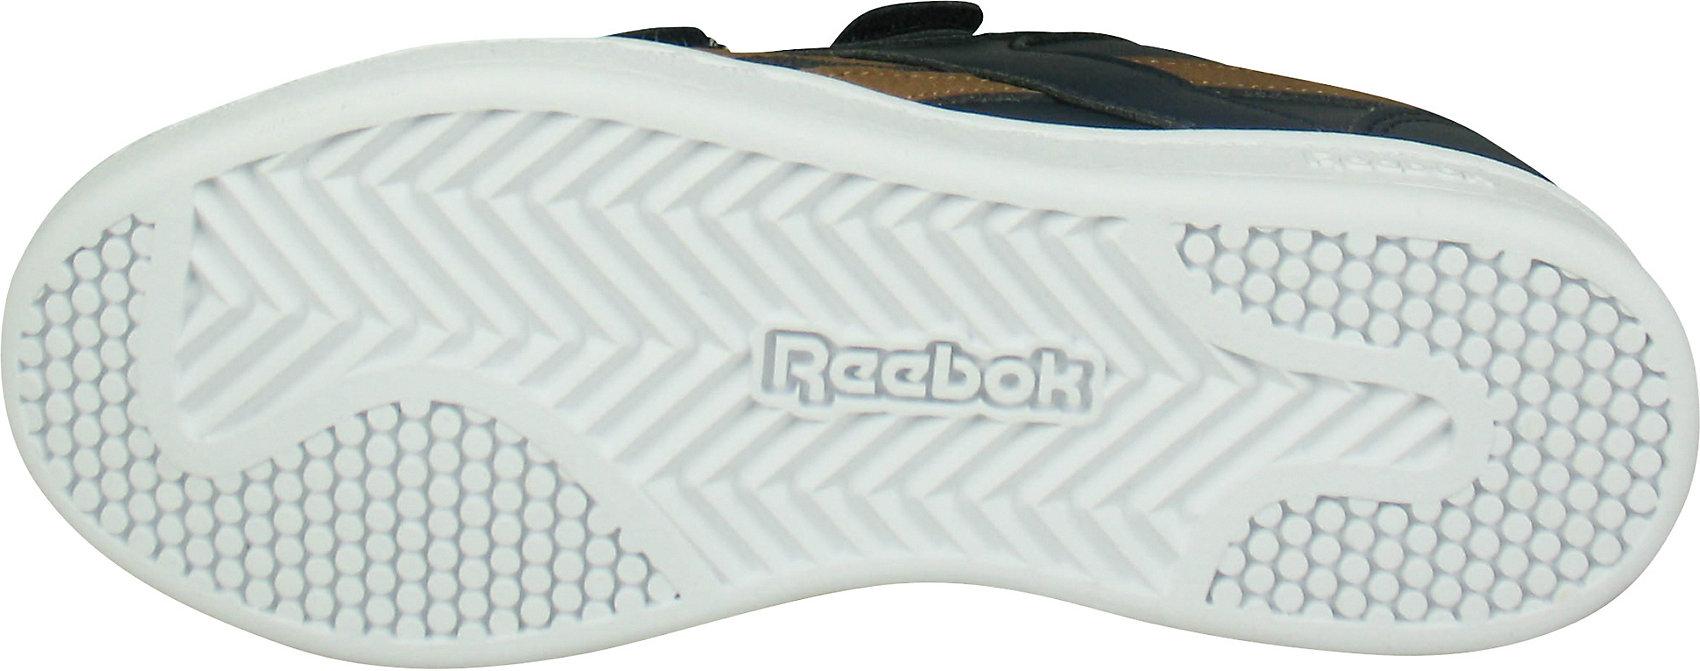 Reebok, Sneakers low ROYAL PRIME für Jungen, dunkelblau